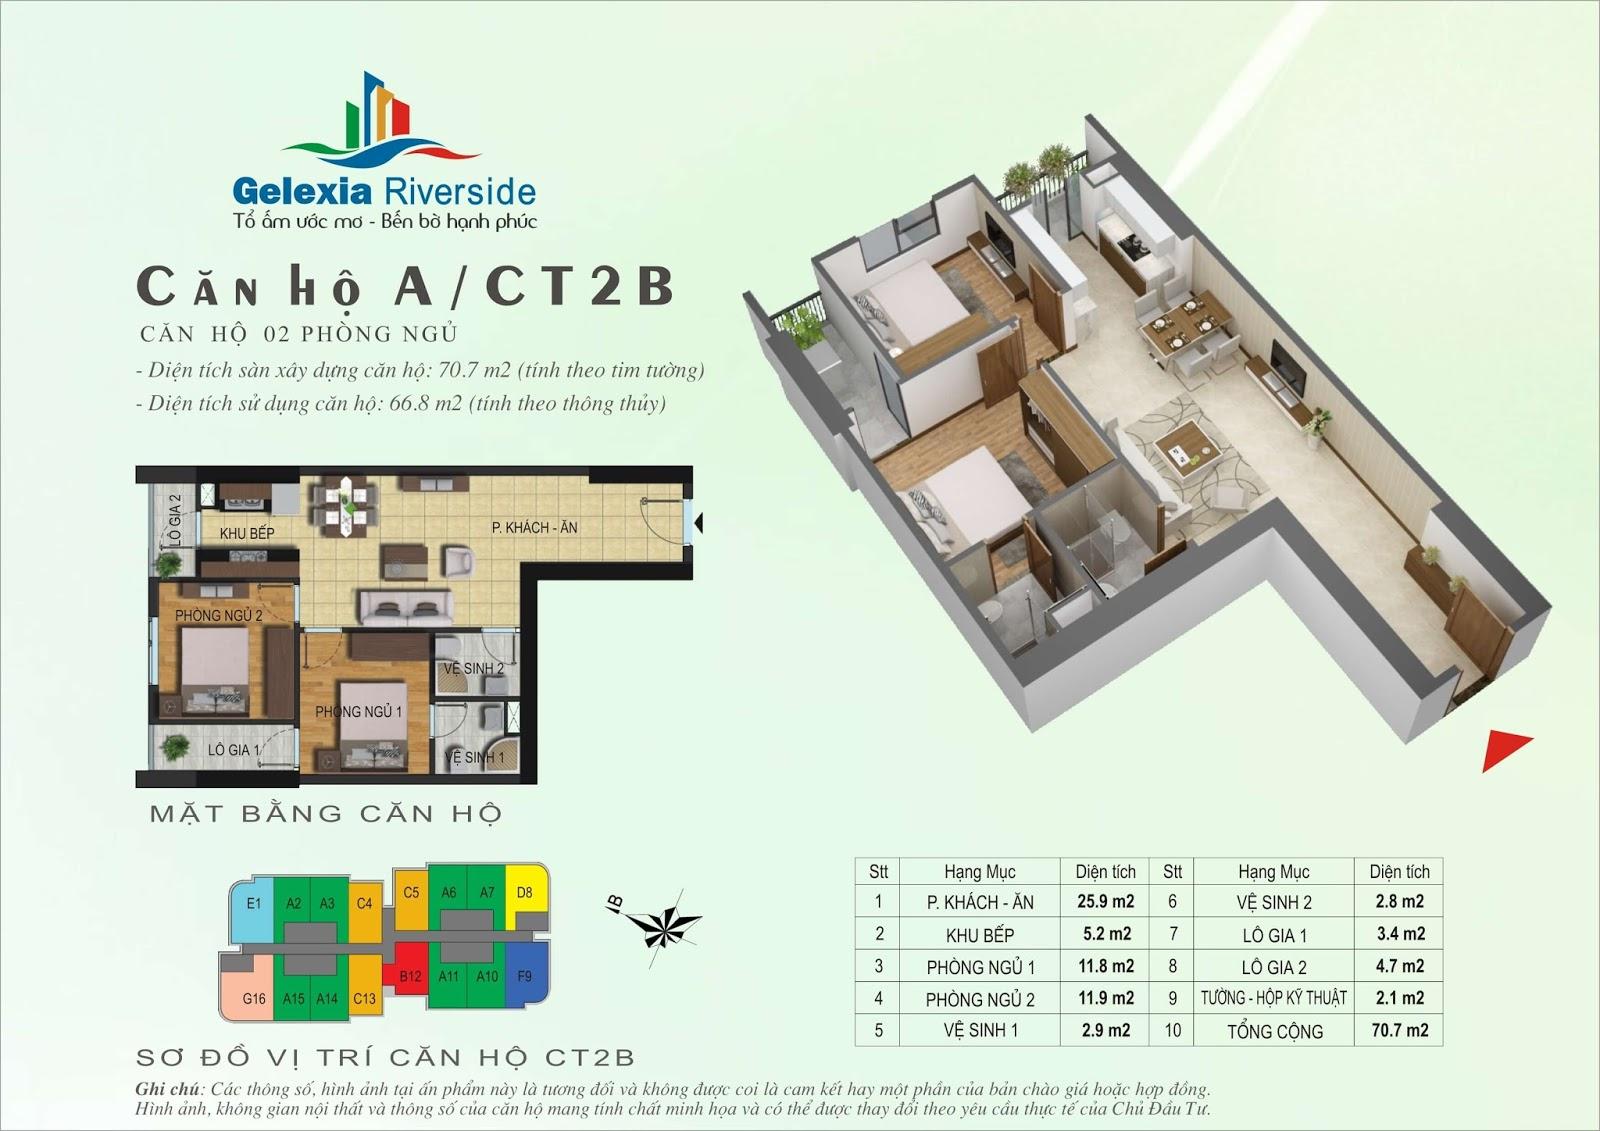 Mặt bằng căn hộ 70,7 m2 tòa CT2B - Gelexia Riverside